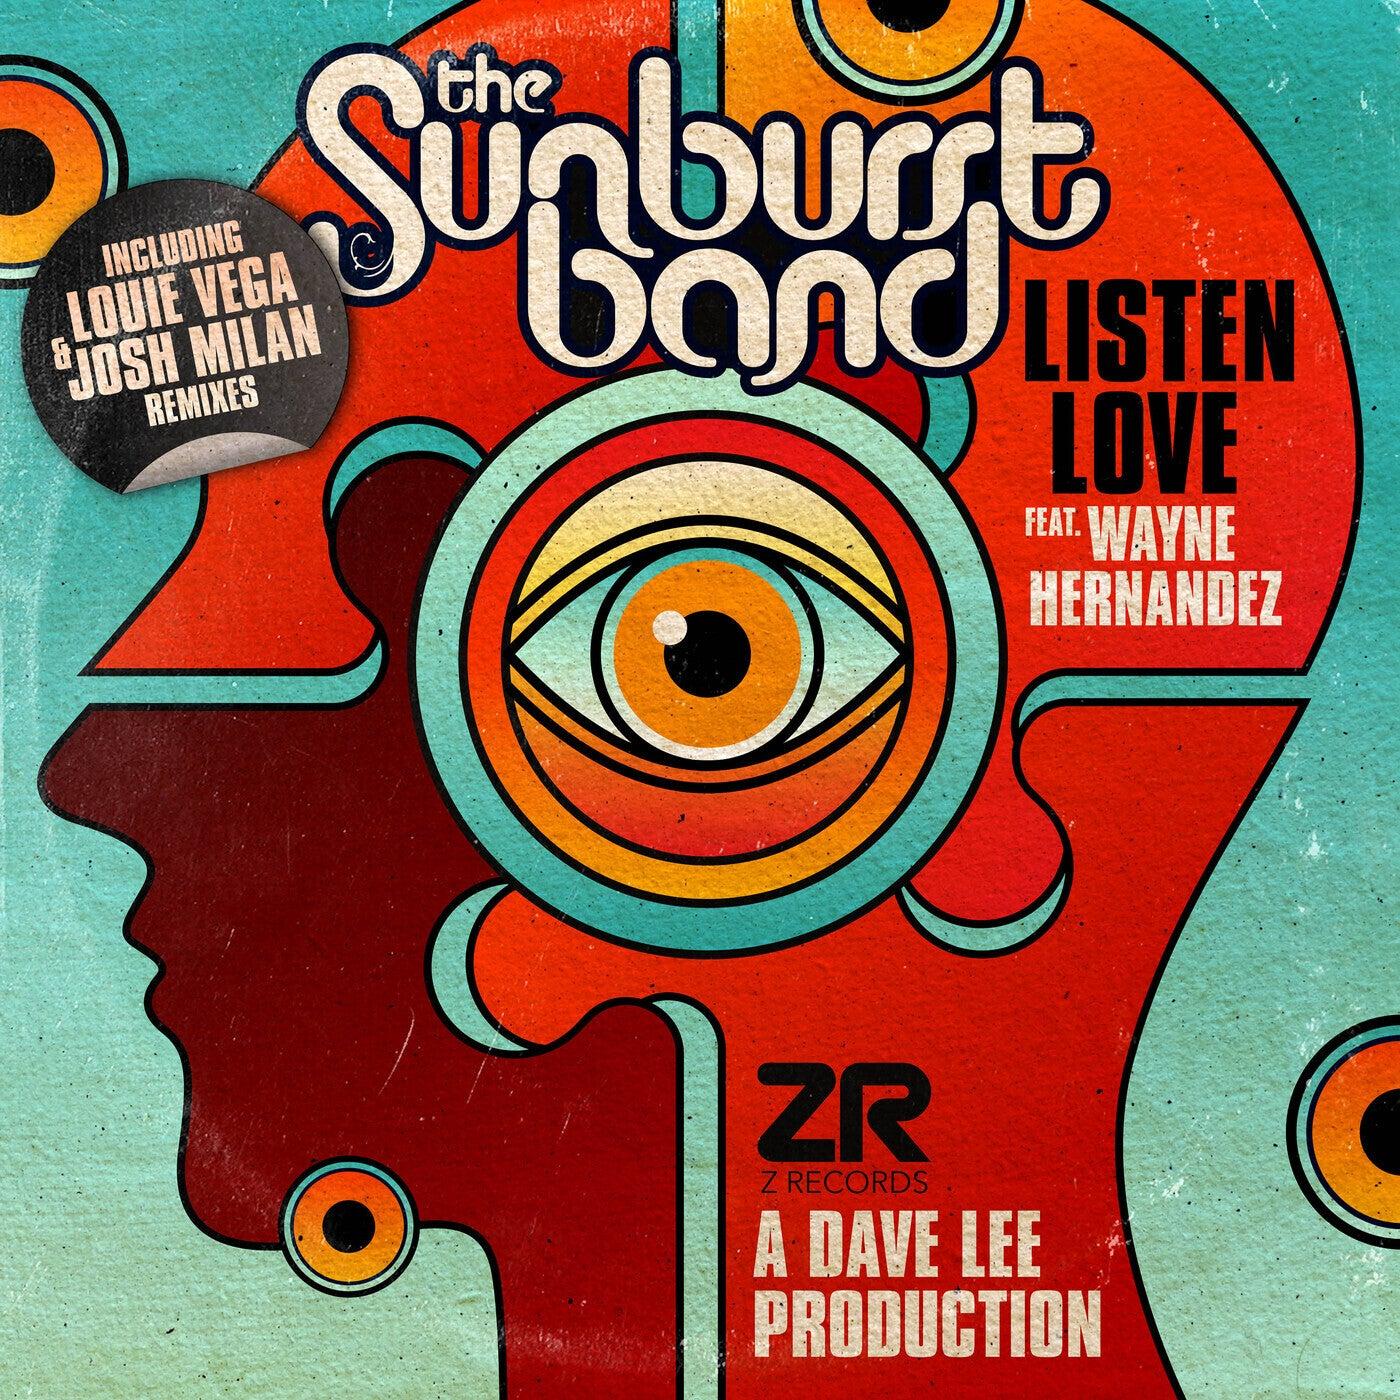 Listen Love (Dave Lee Jazz Funk Renaissance Mix)